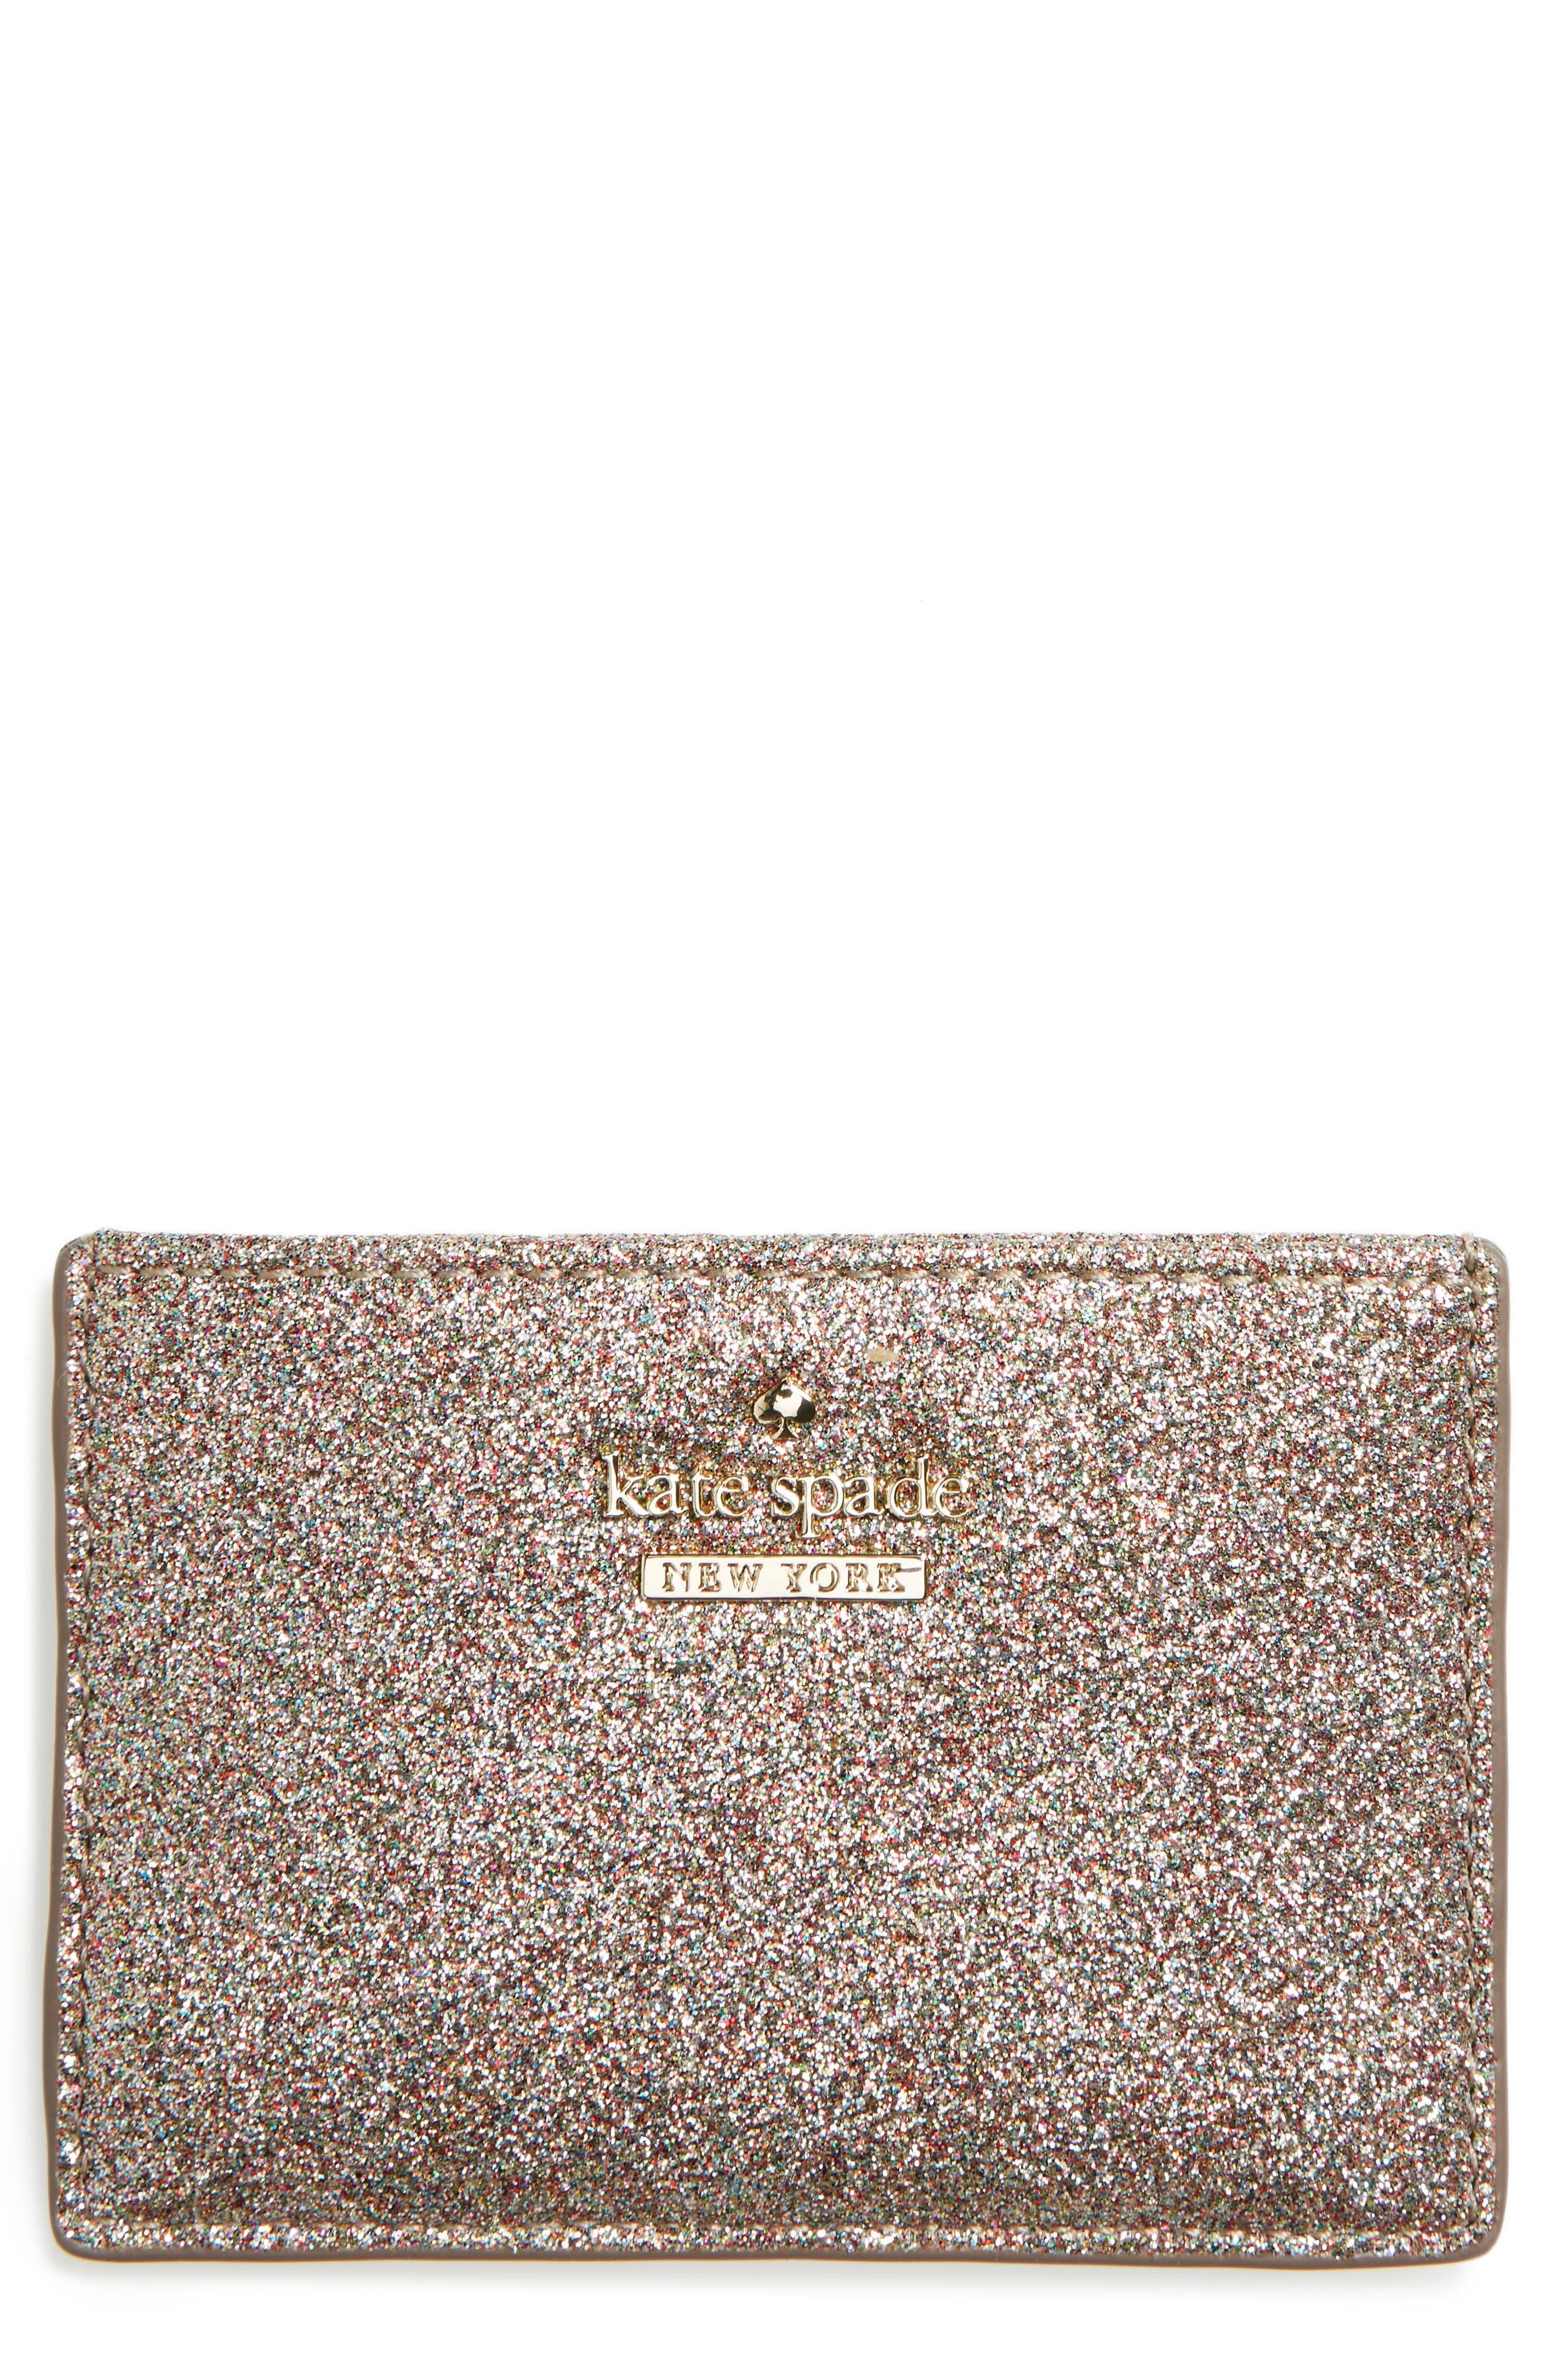 Main Image - kate spade new york burgess court glitter card holder